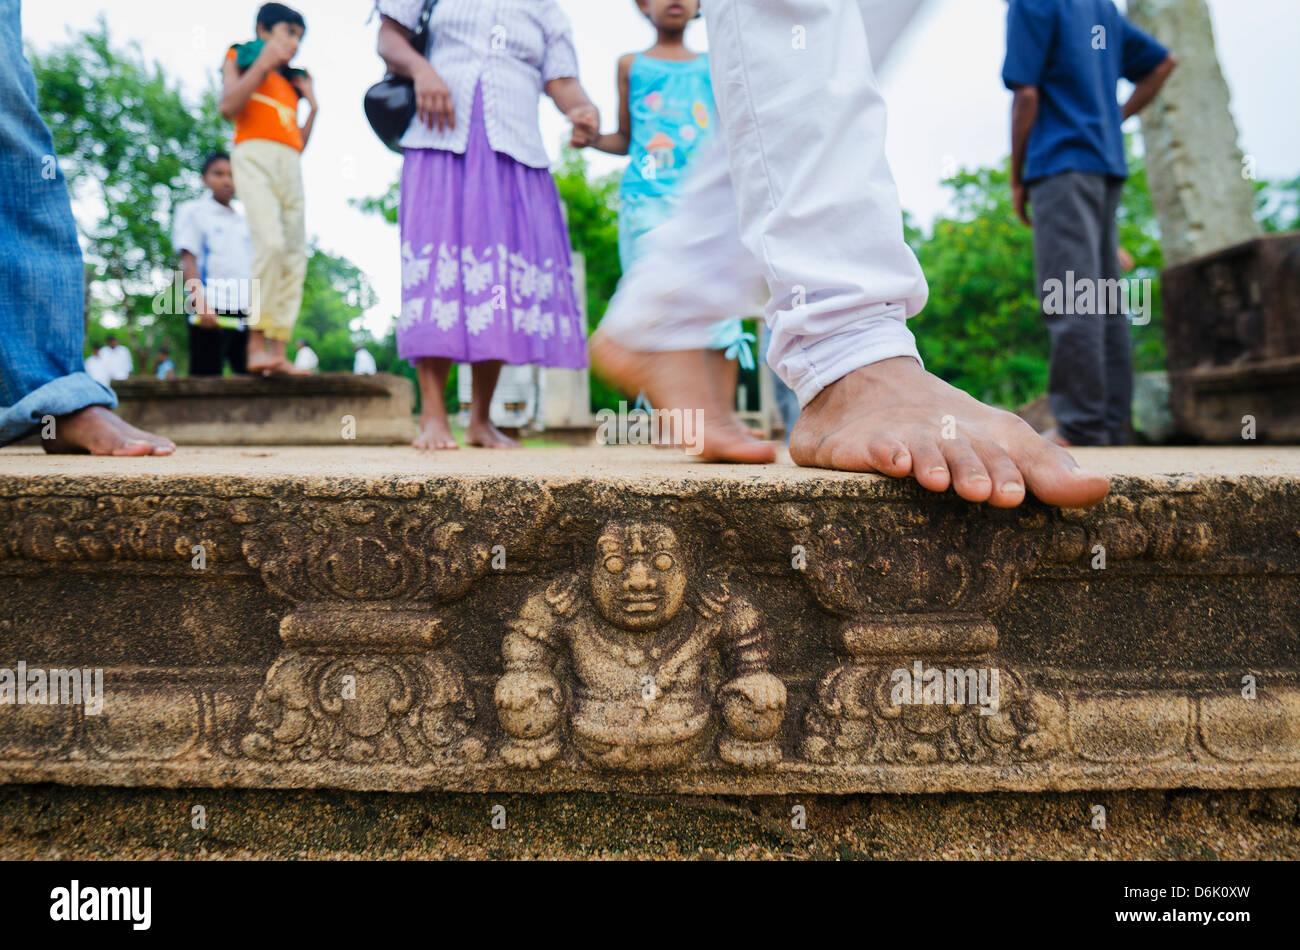 Carved steps detail, Mahasens Palace, Anuradhapura, UNESCO World Heritage Site, Sri Lanka, Asia - Stock Image